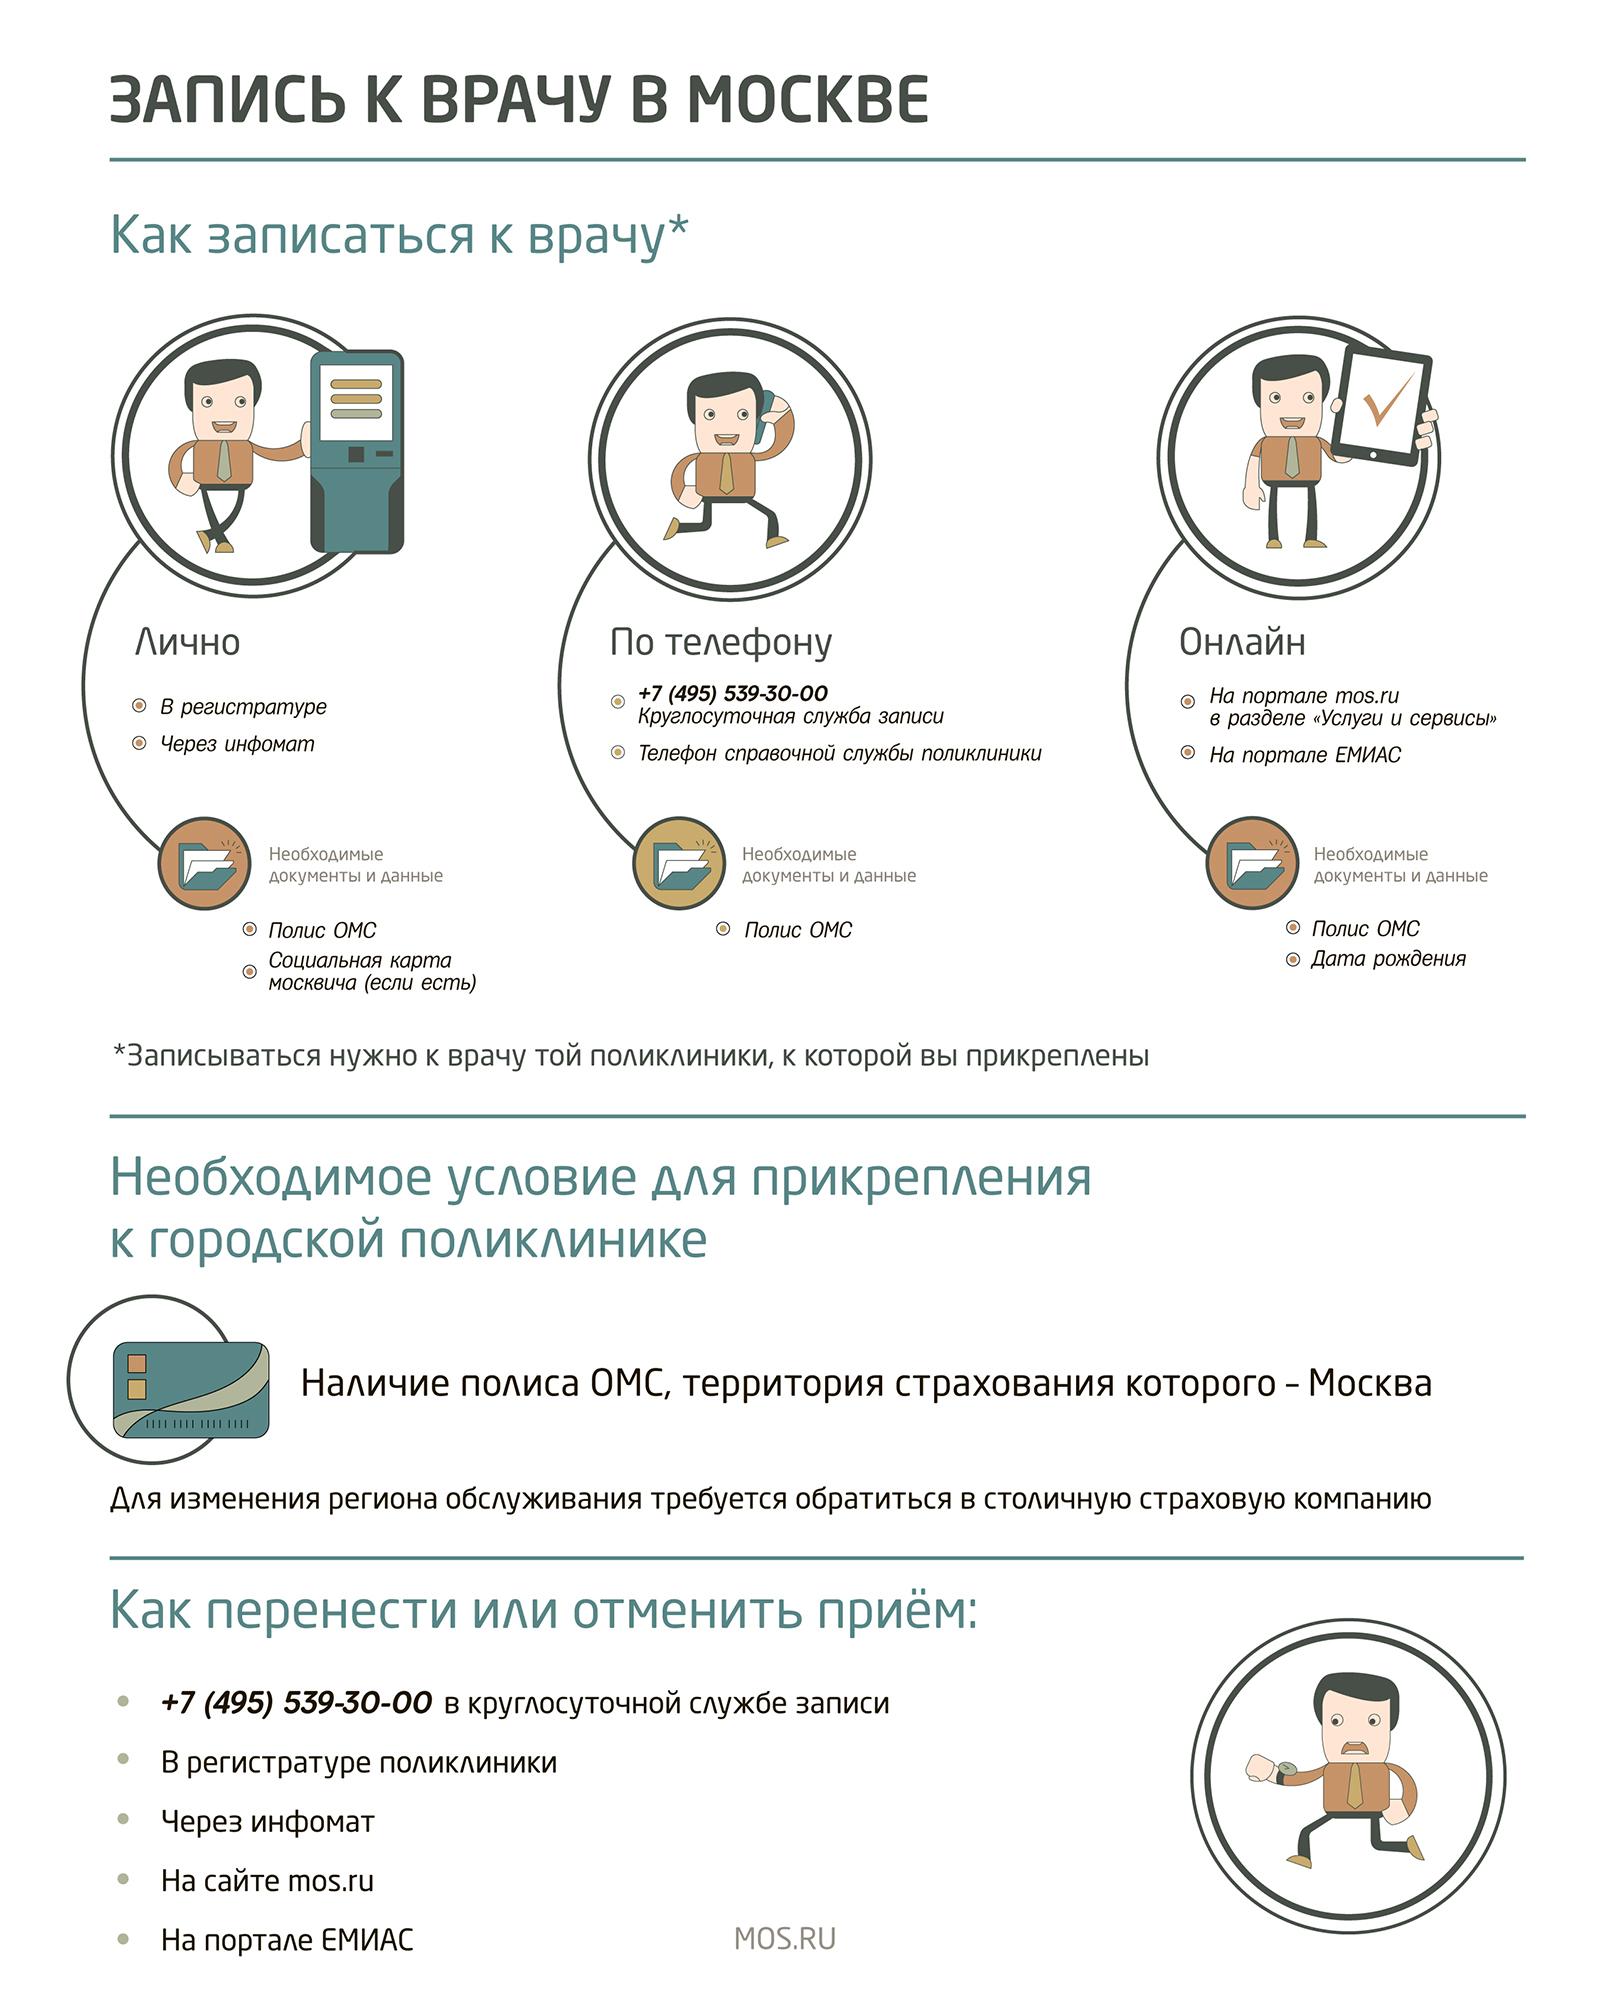 Крисы bot telegram Каспийск Мет  Интернет Октябрьский